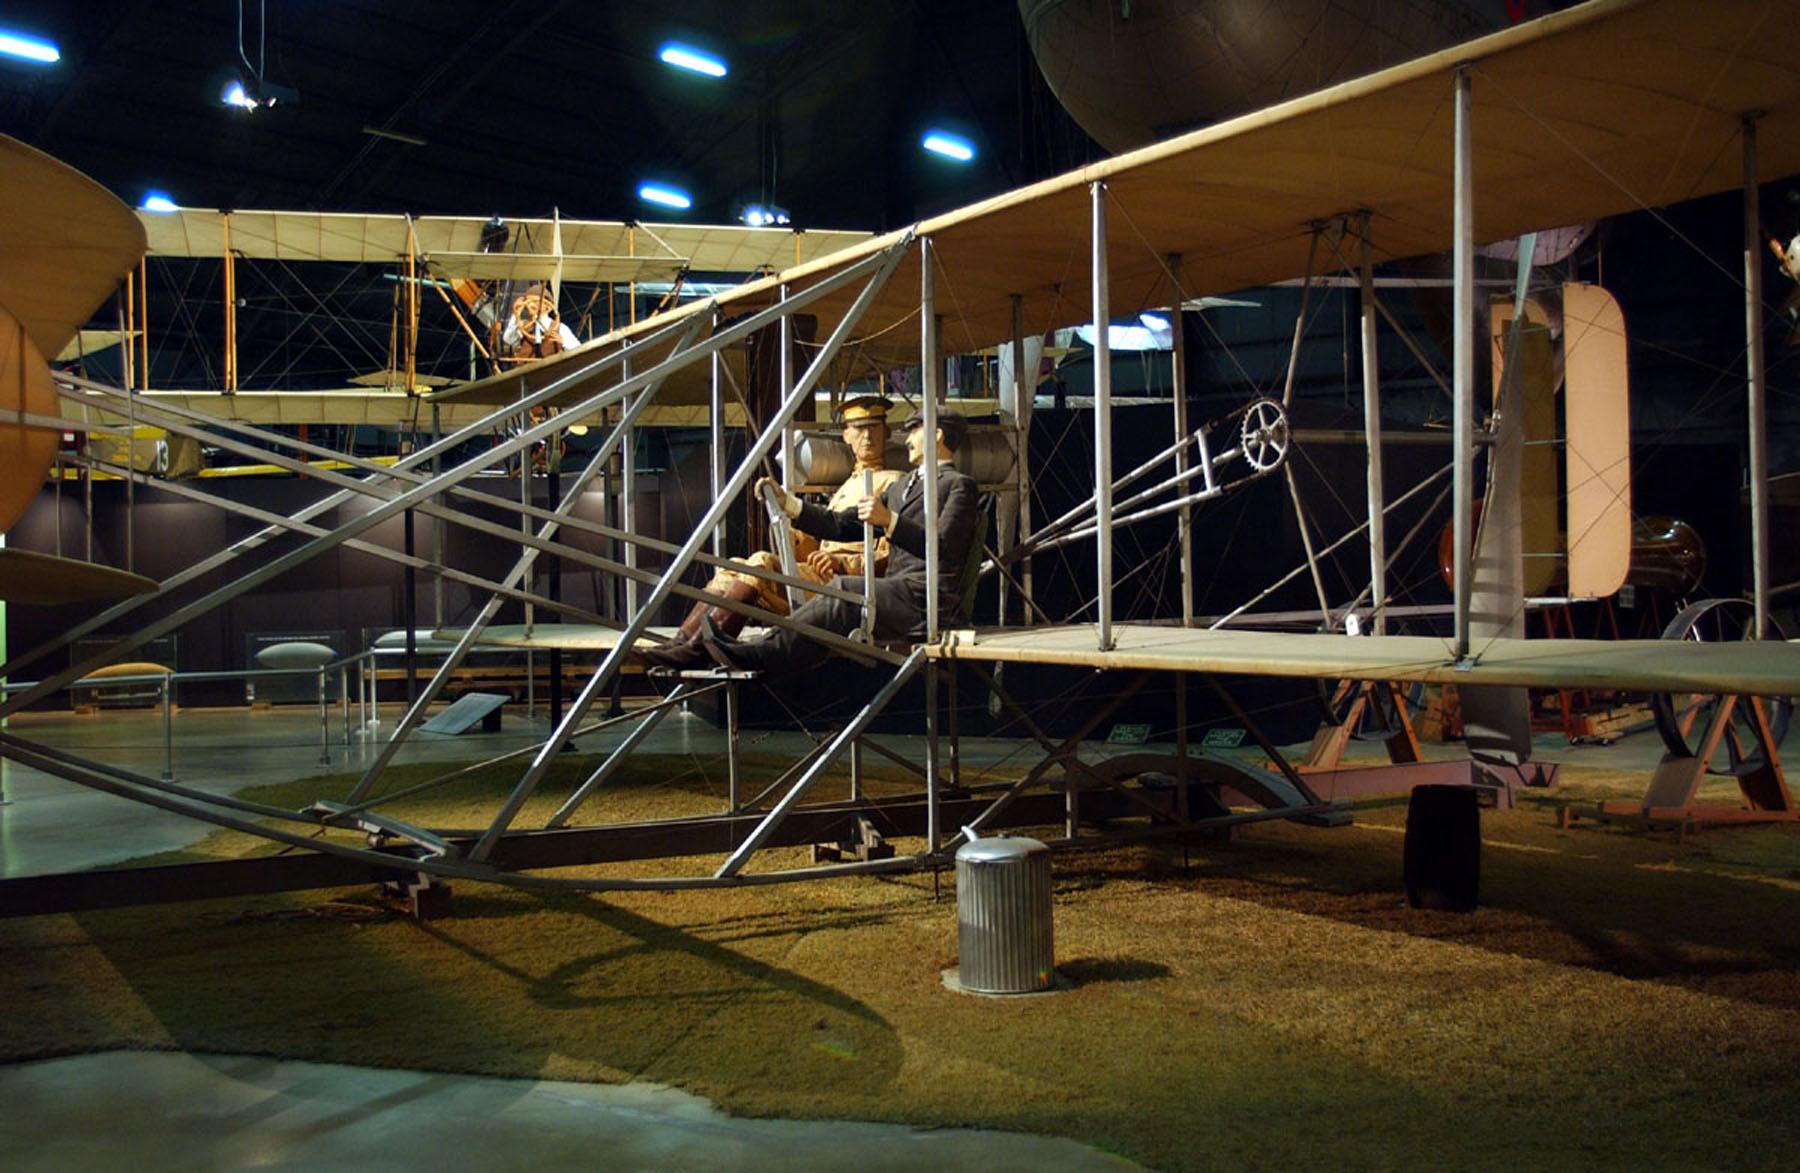 http://upload.wikimedia.org/wikipedia/commons/6/68/1909_Wright_Flyer_USAF.jpg